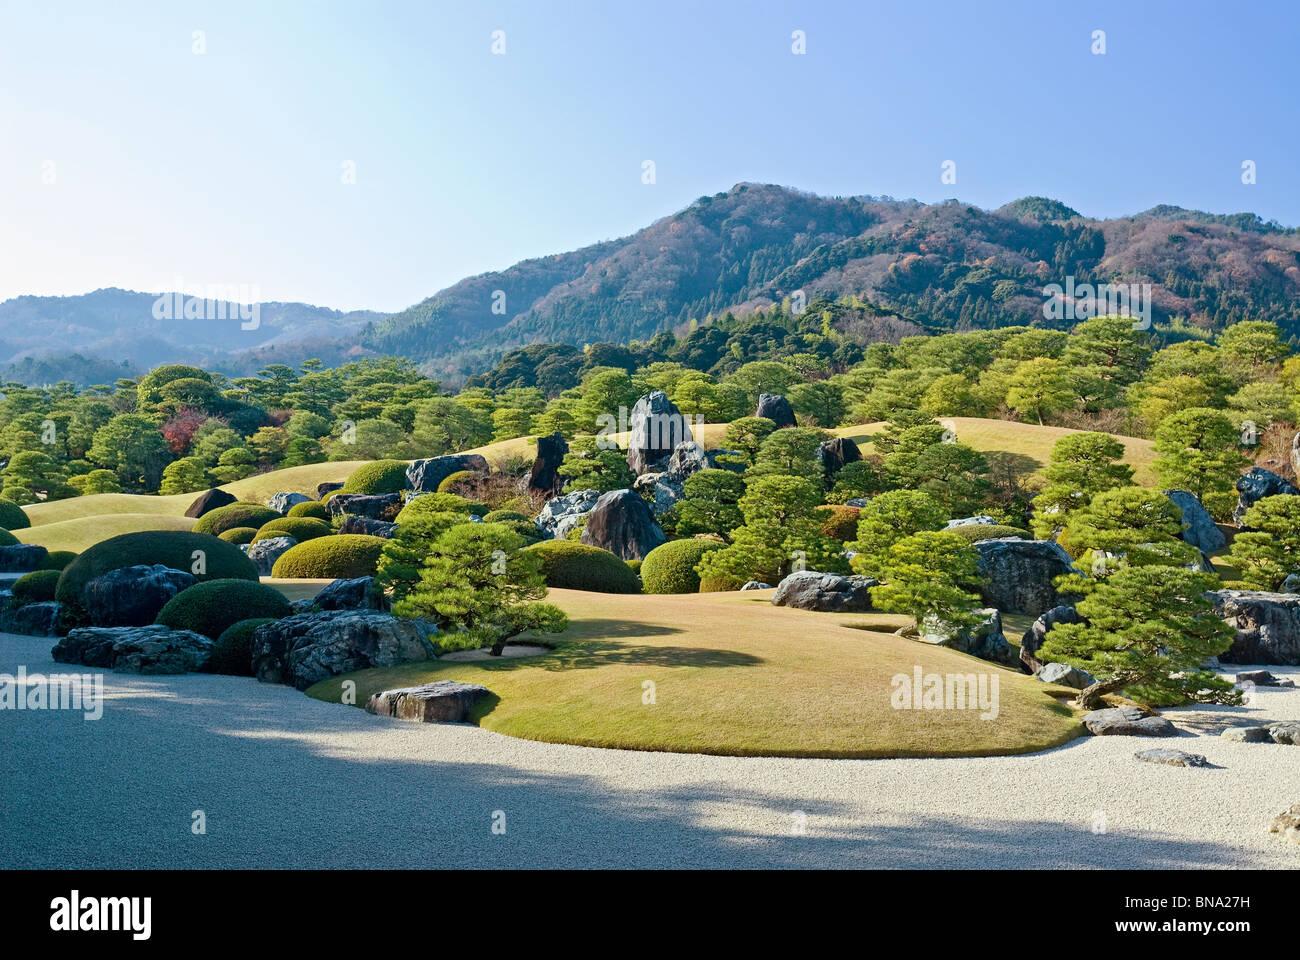 trockene landschaft japanischer garten pr fektur shimane stockfoto bild 30339445 alamy. Black Bedroom Furniture Sets. Home Design Ideas